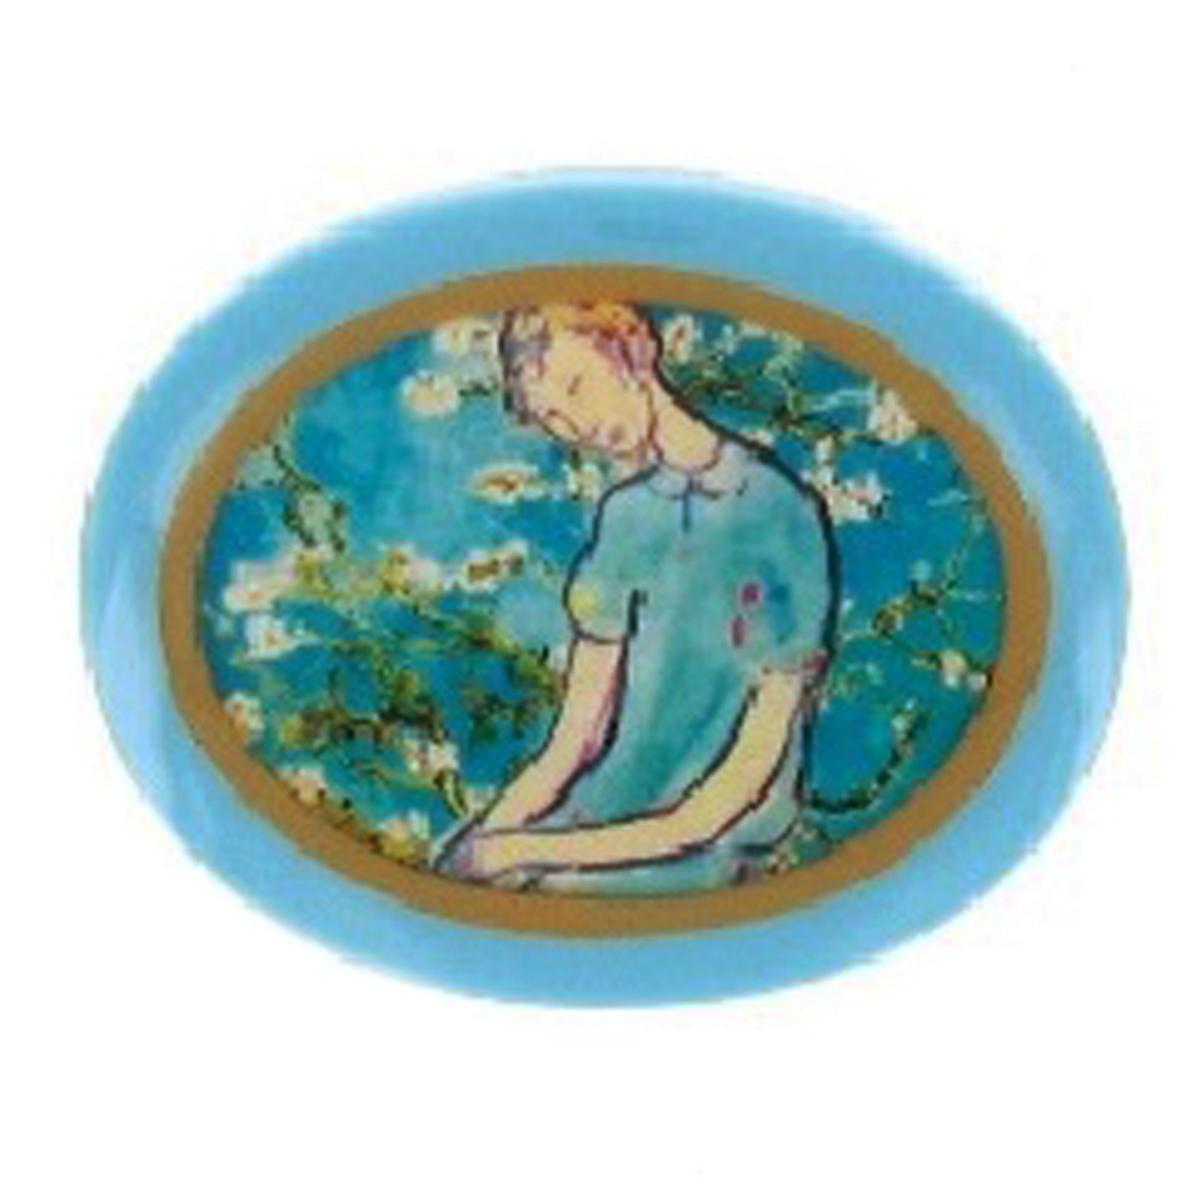 Broche artisanale \'Mistinguette\' turquoise - 55x45 mm - [R4281]